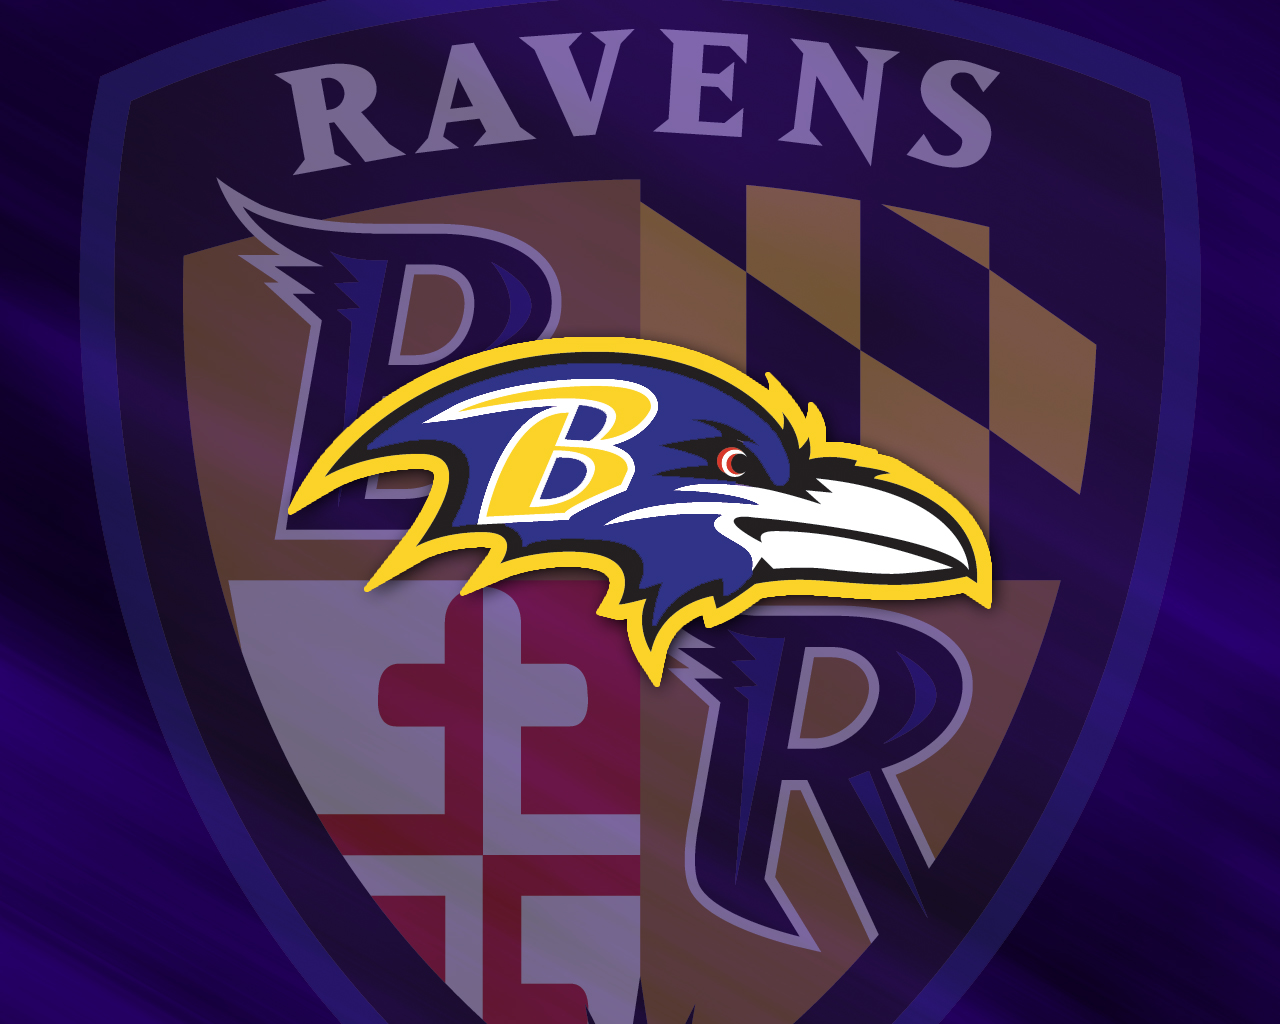 Ravens logo Wallpaper